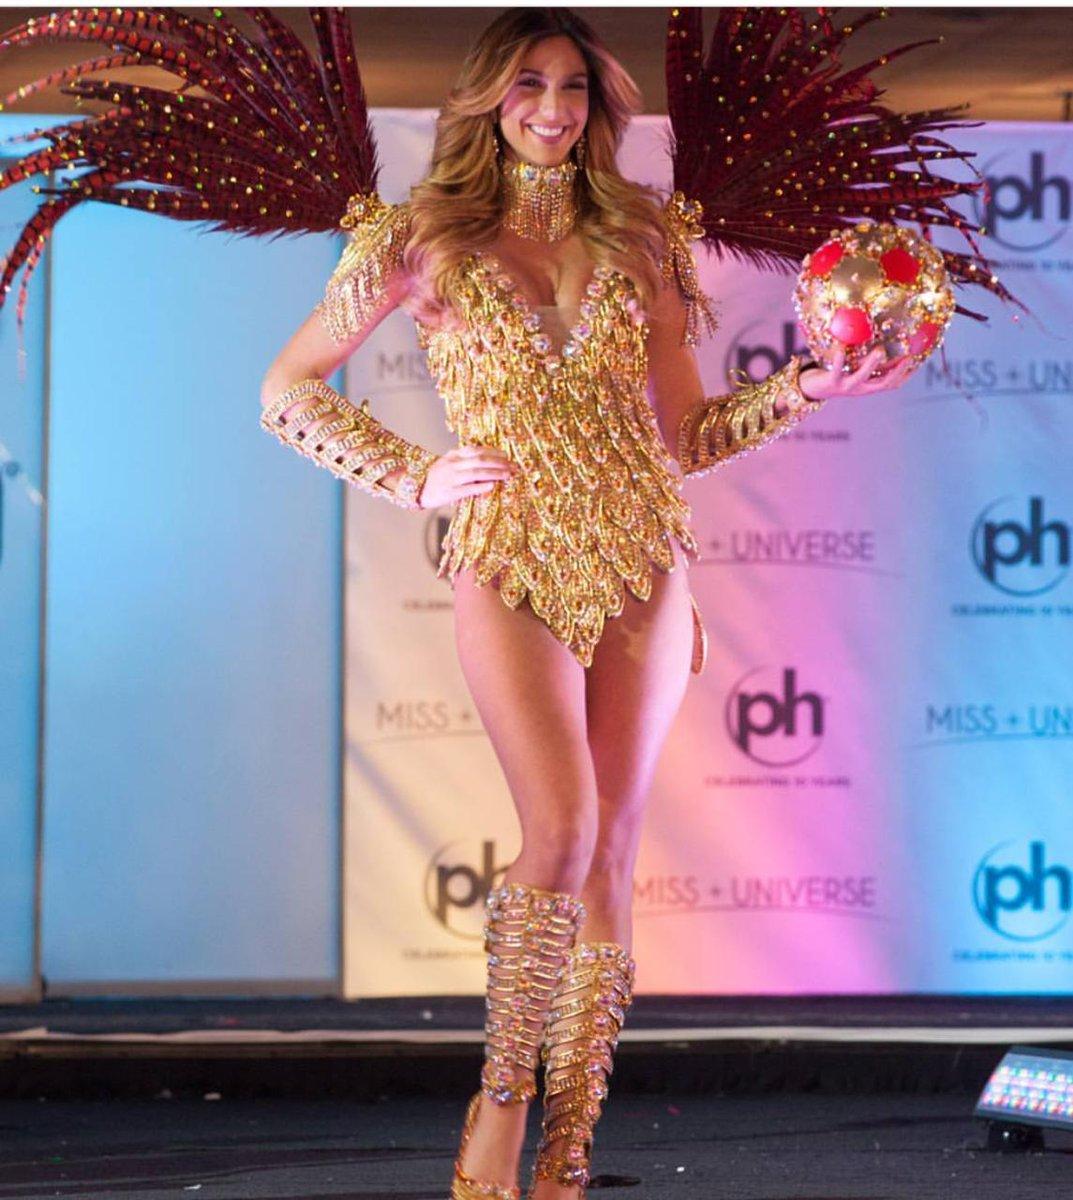 Bella lala land #MissUniverse #Panama pic.twitter.com/s0nM5DSkga